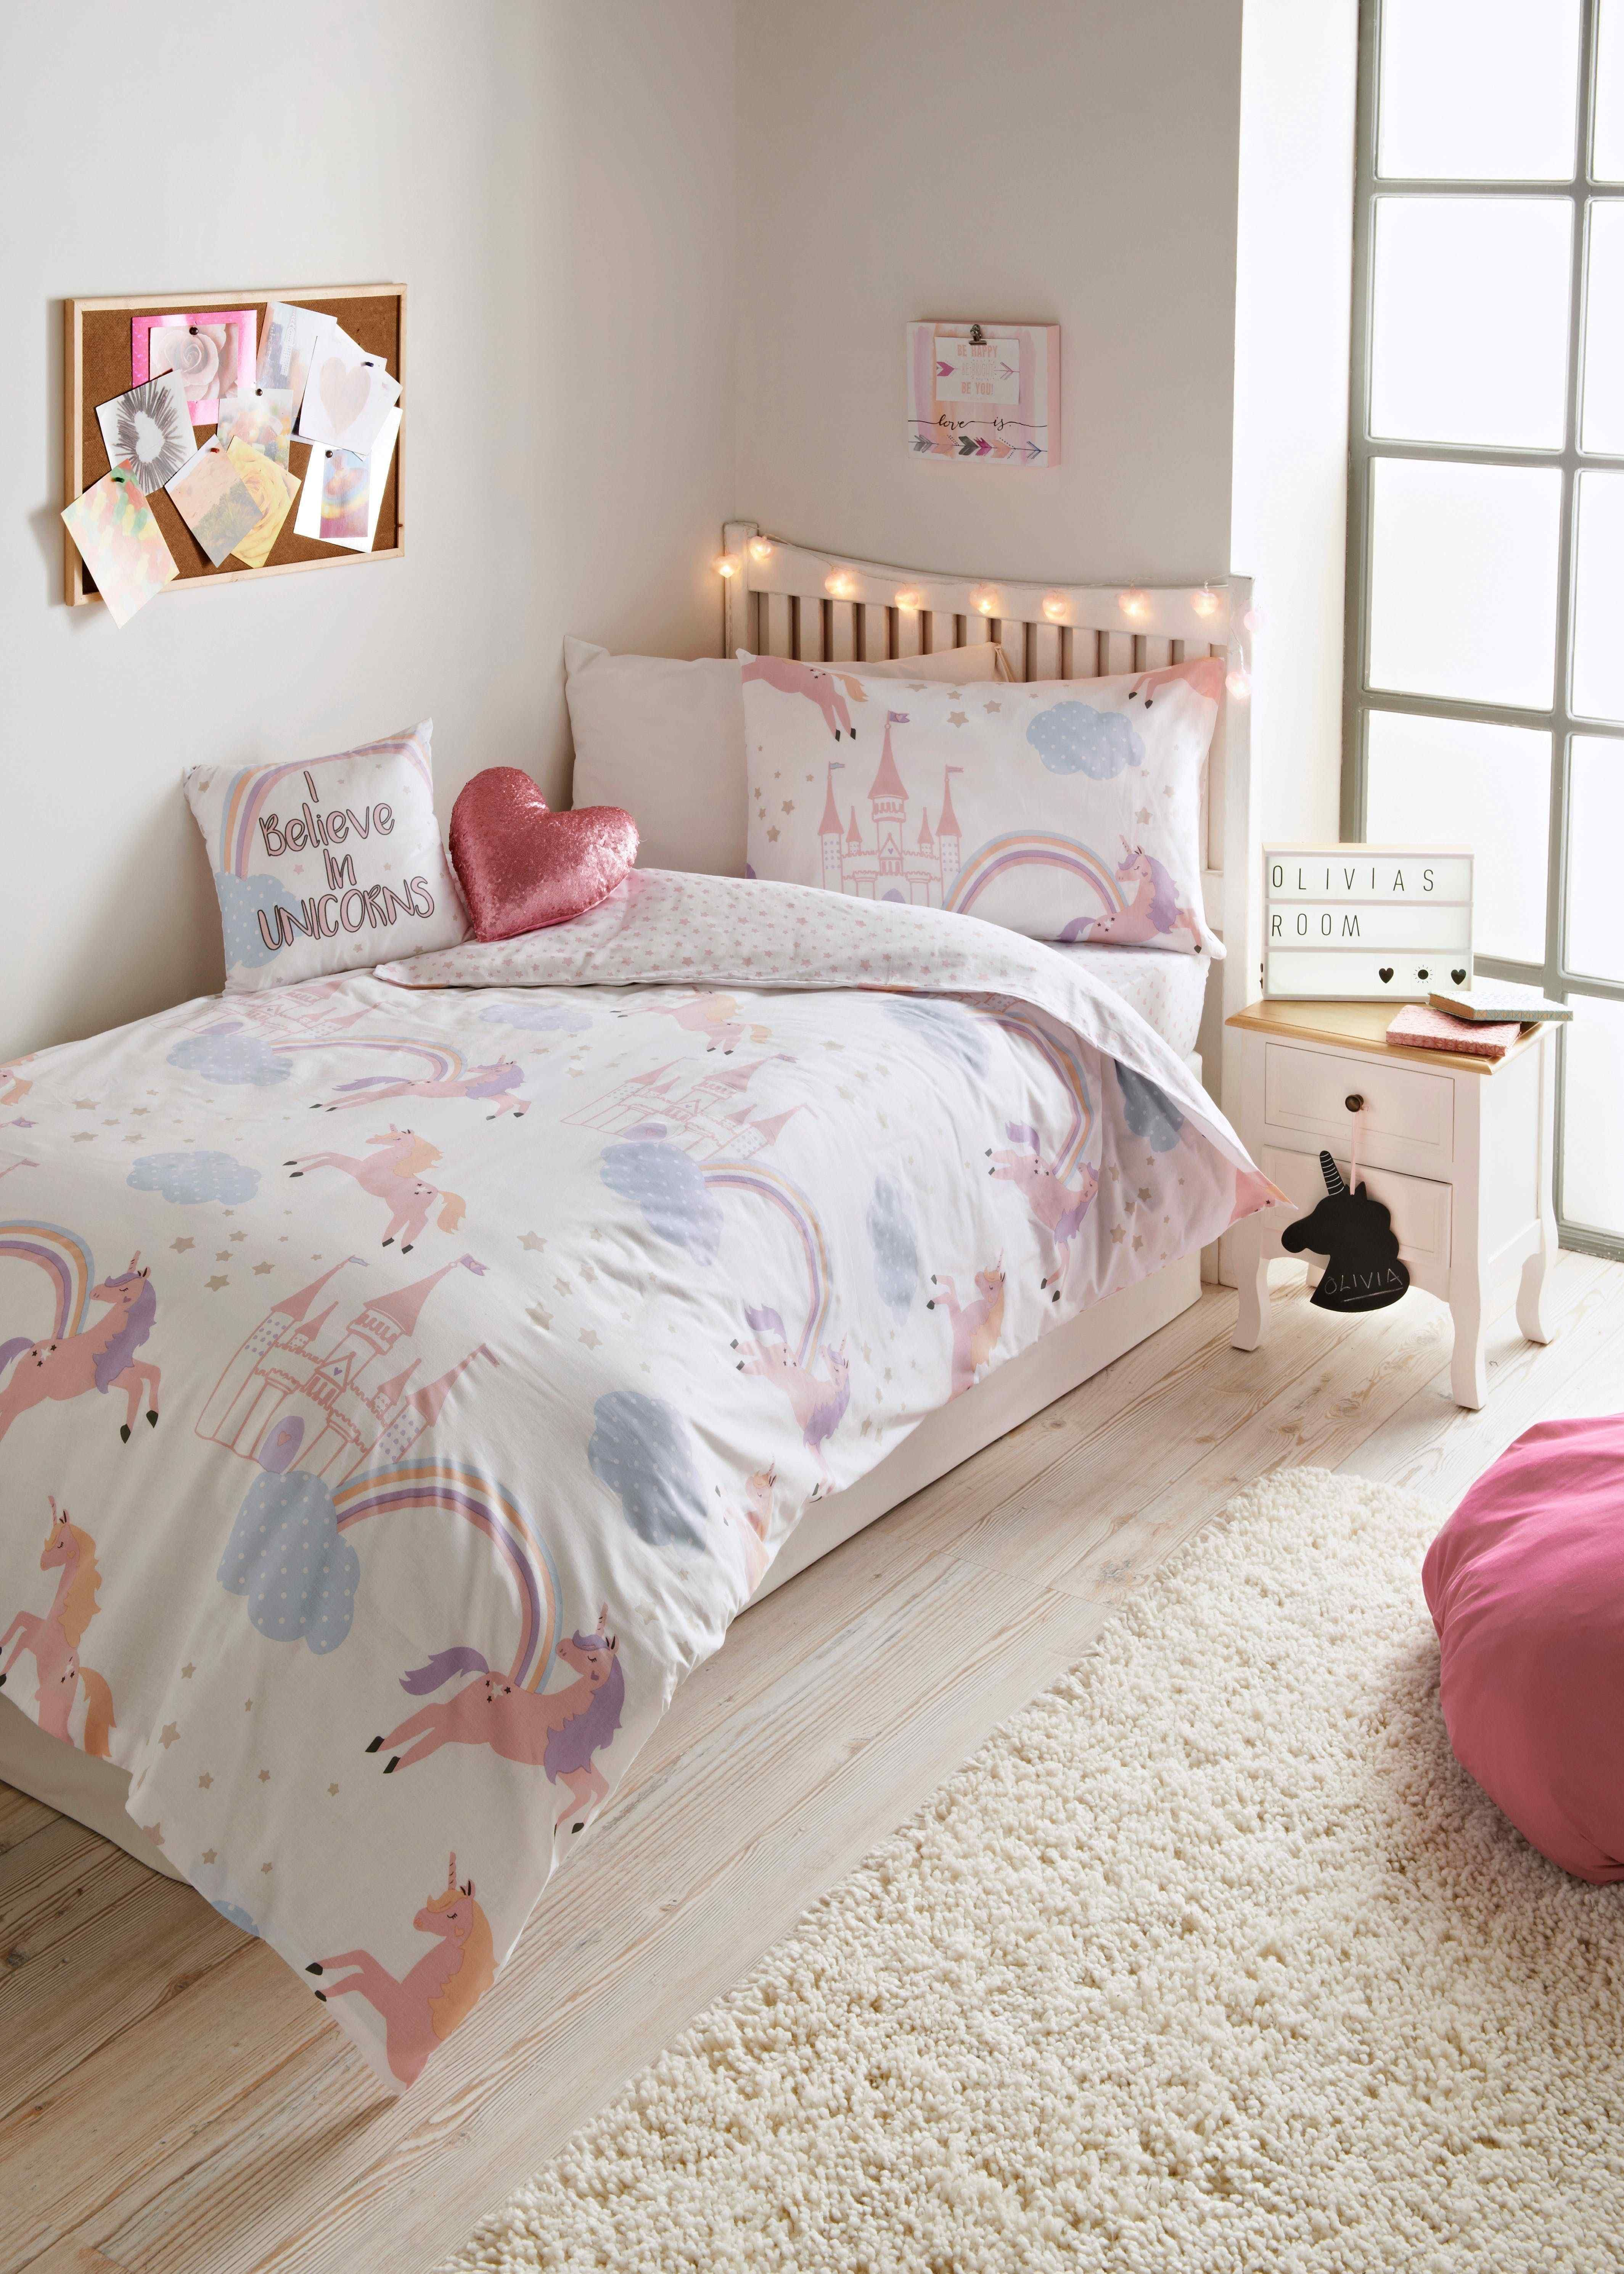 Most popular ways to Best Of Unicorn Bedroom Ideas Pottery